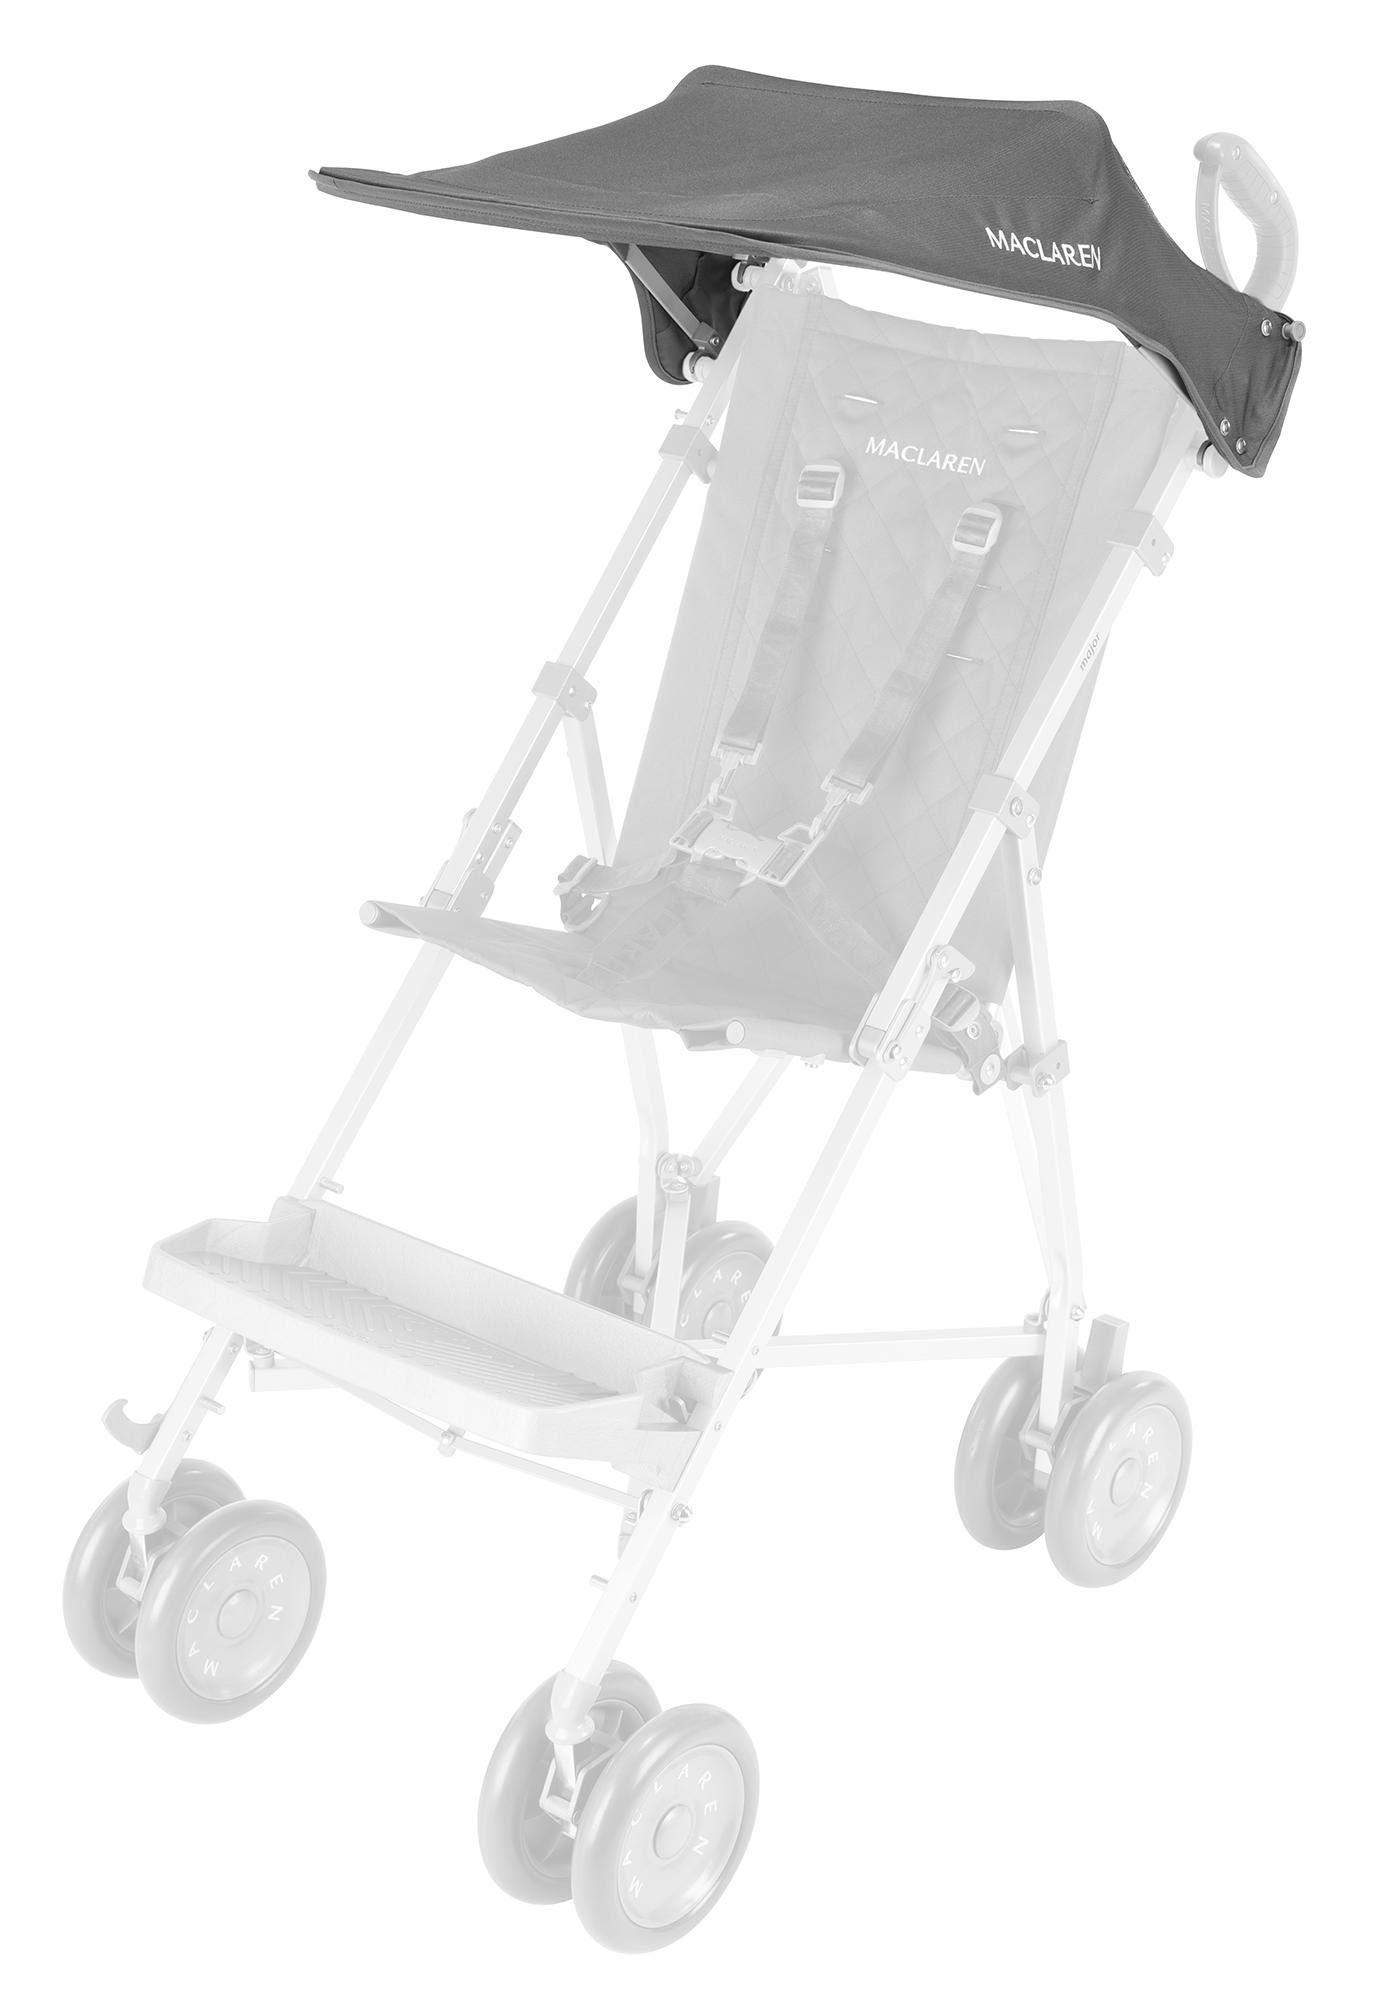 Maclaren Major Elite Push Chair, Sunshade, Charcoal Color